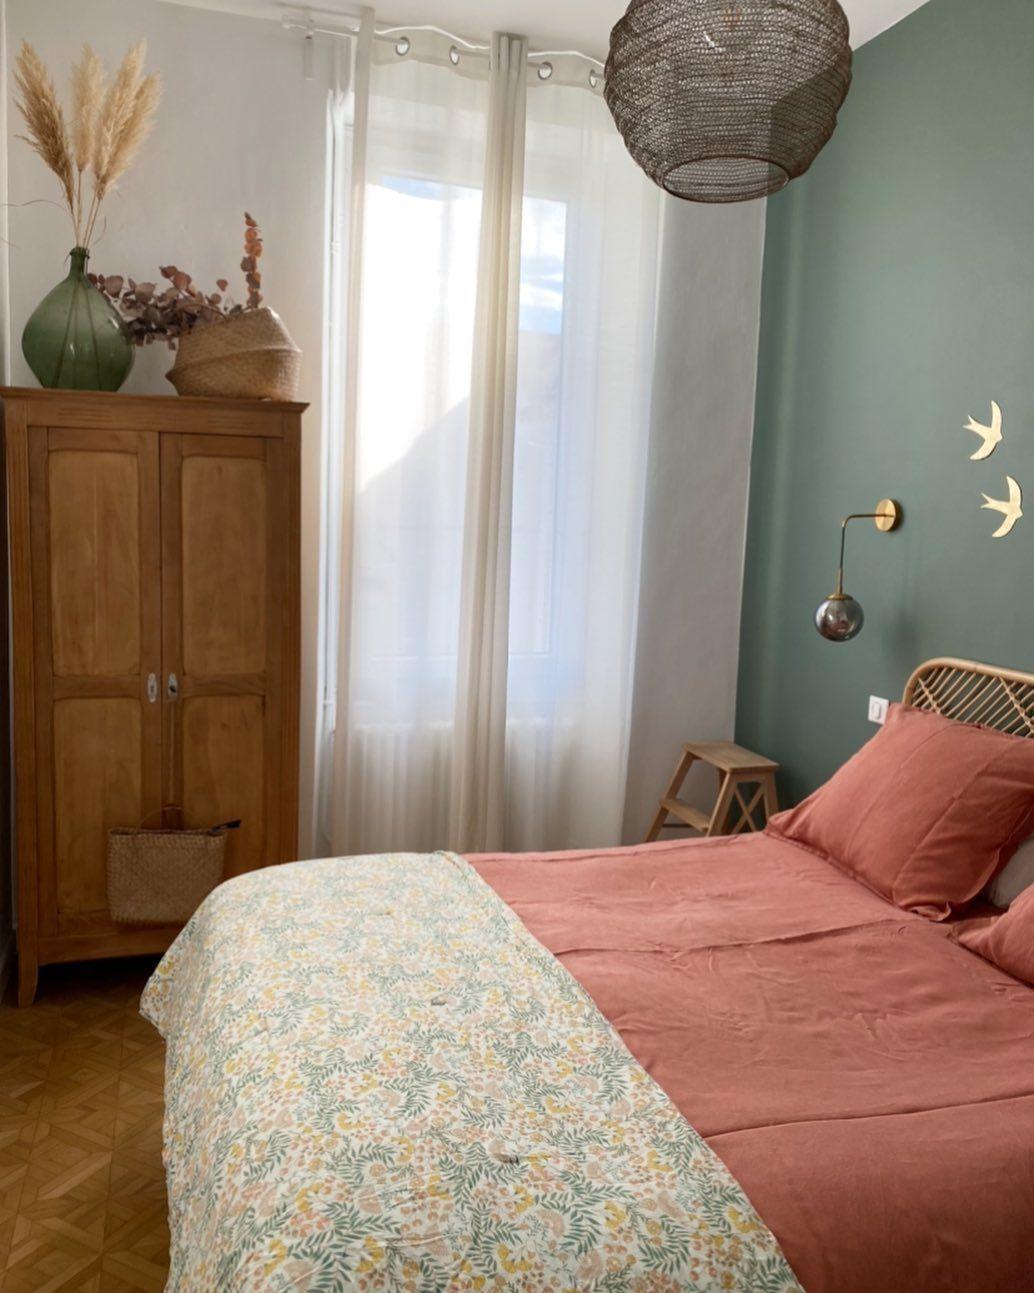 "@mytomettes's Instagram photo: ""j e u d i 🌿 #home #homesweethome #homedecor #interiordesign #decorationinterieur #decorationinterieur #bedroomdecor #bedroominspiration…"""